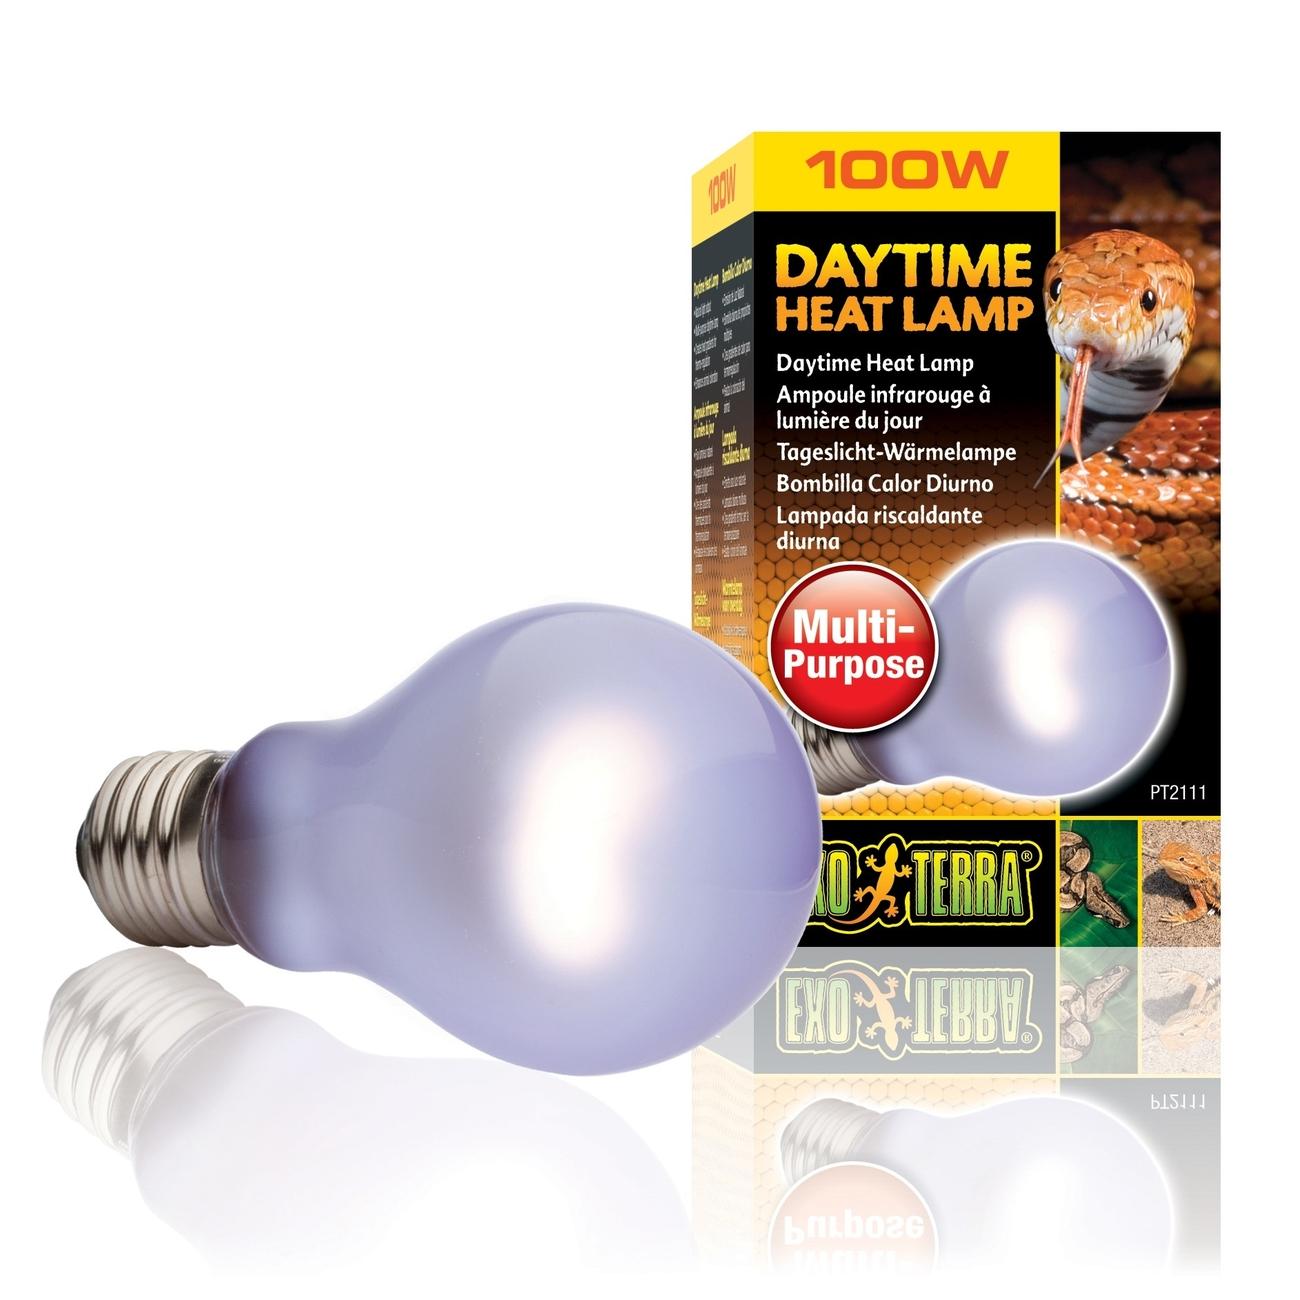 Exo Terra - Daytime Heat Lampe Bild 11